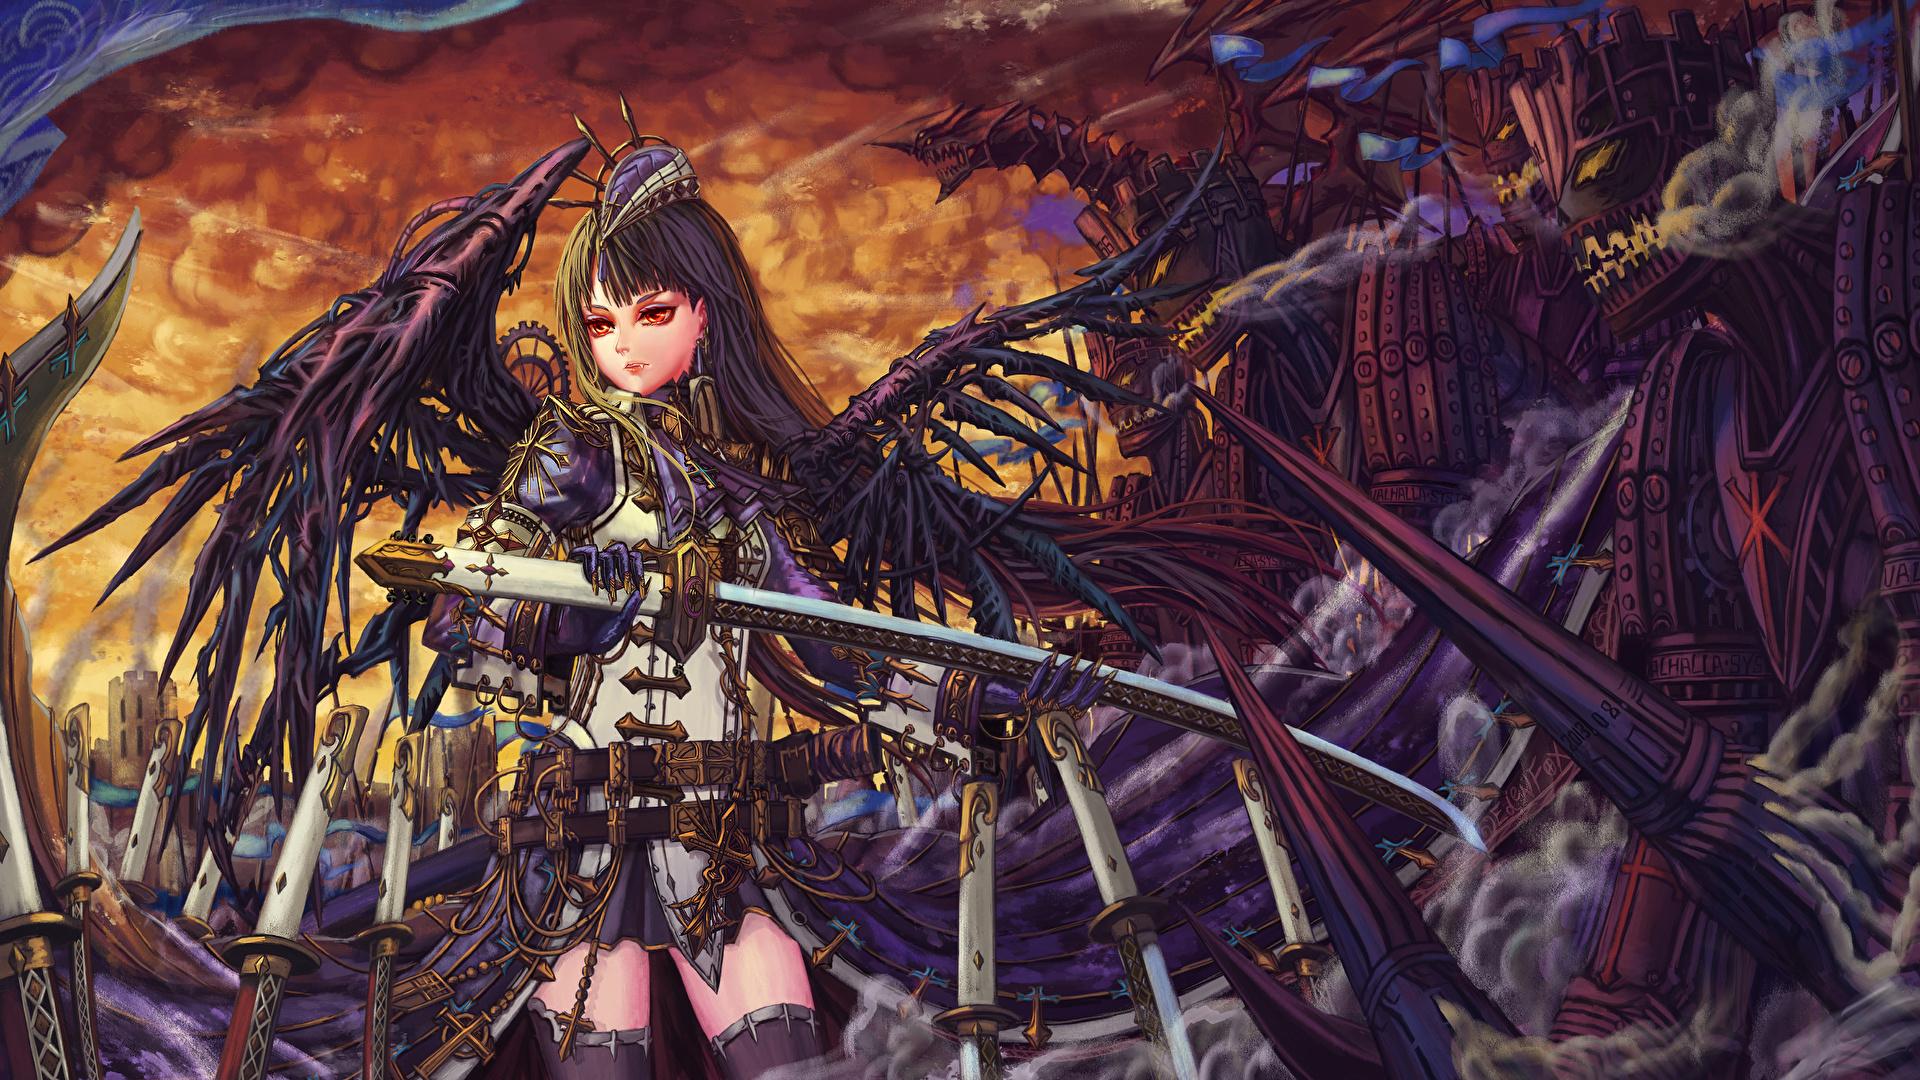 Steampunk Fantasy Anime Girl Art - HD Wallpaper